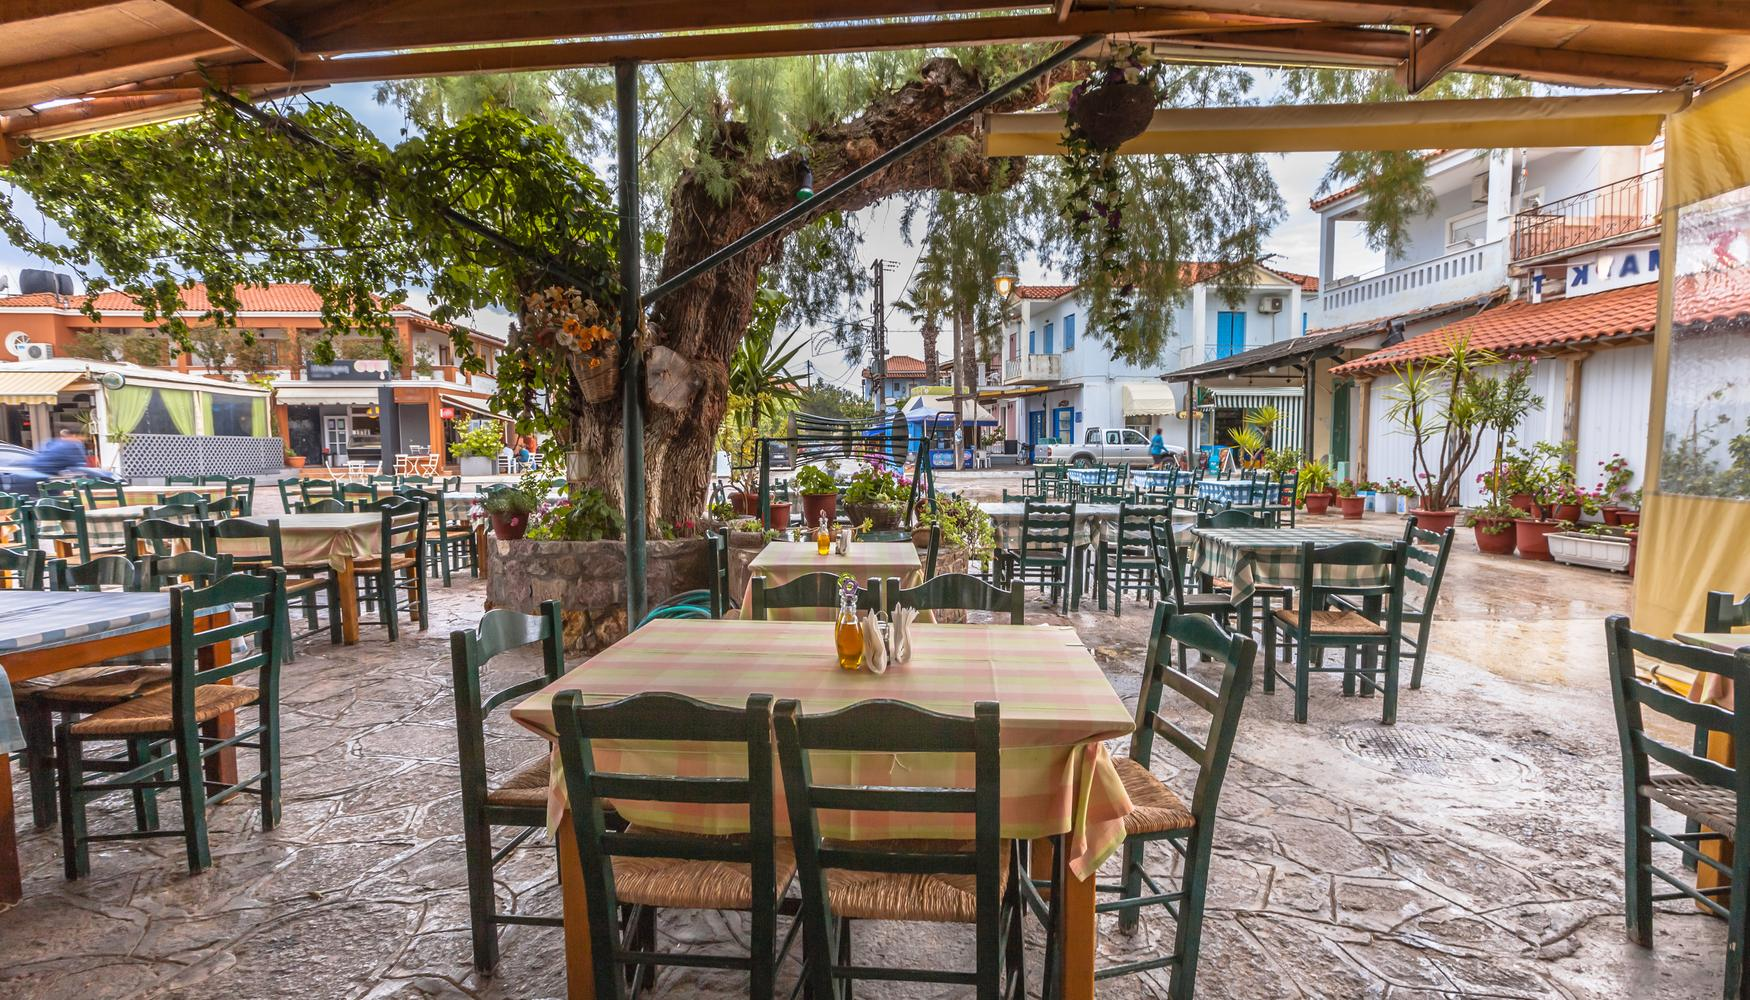 Kypros autonvuokraukset